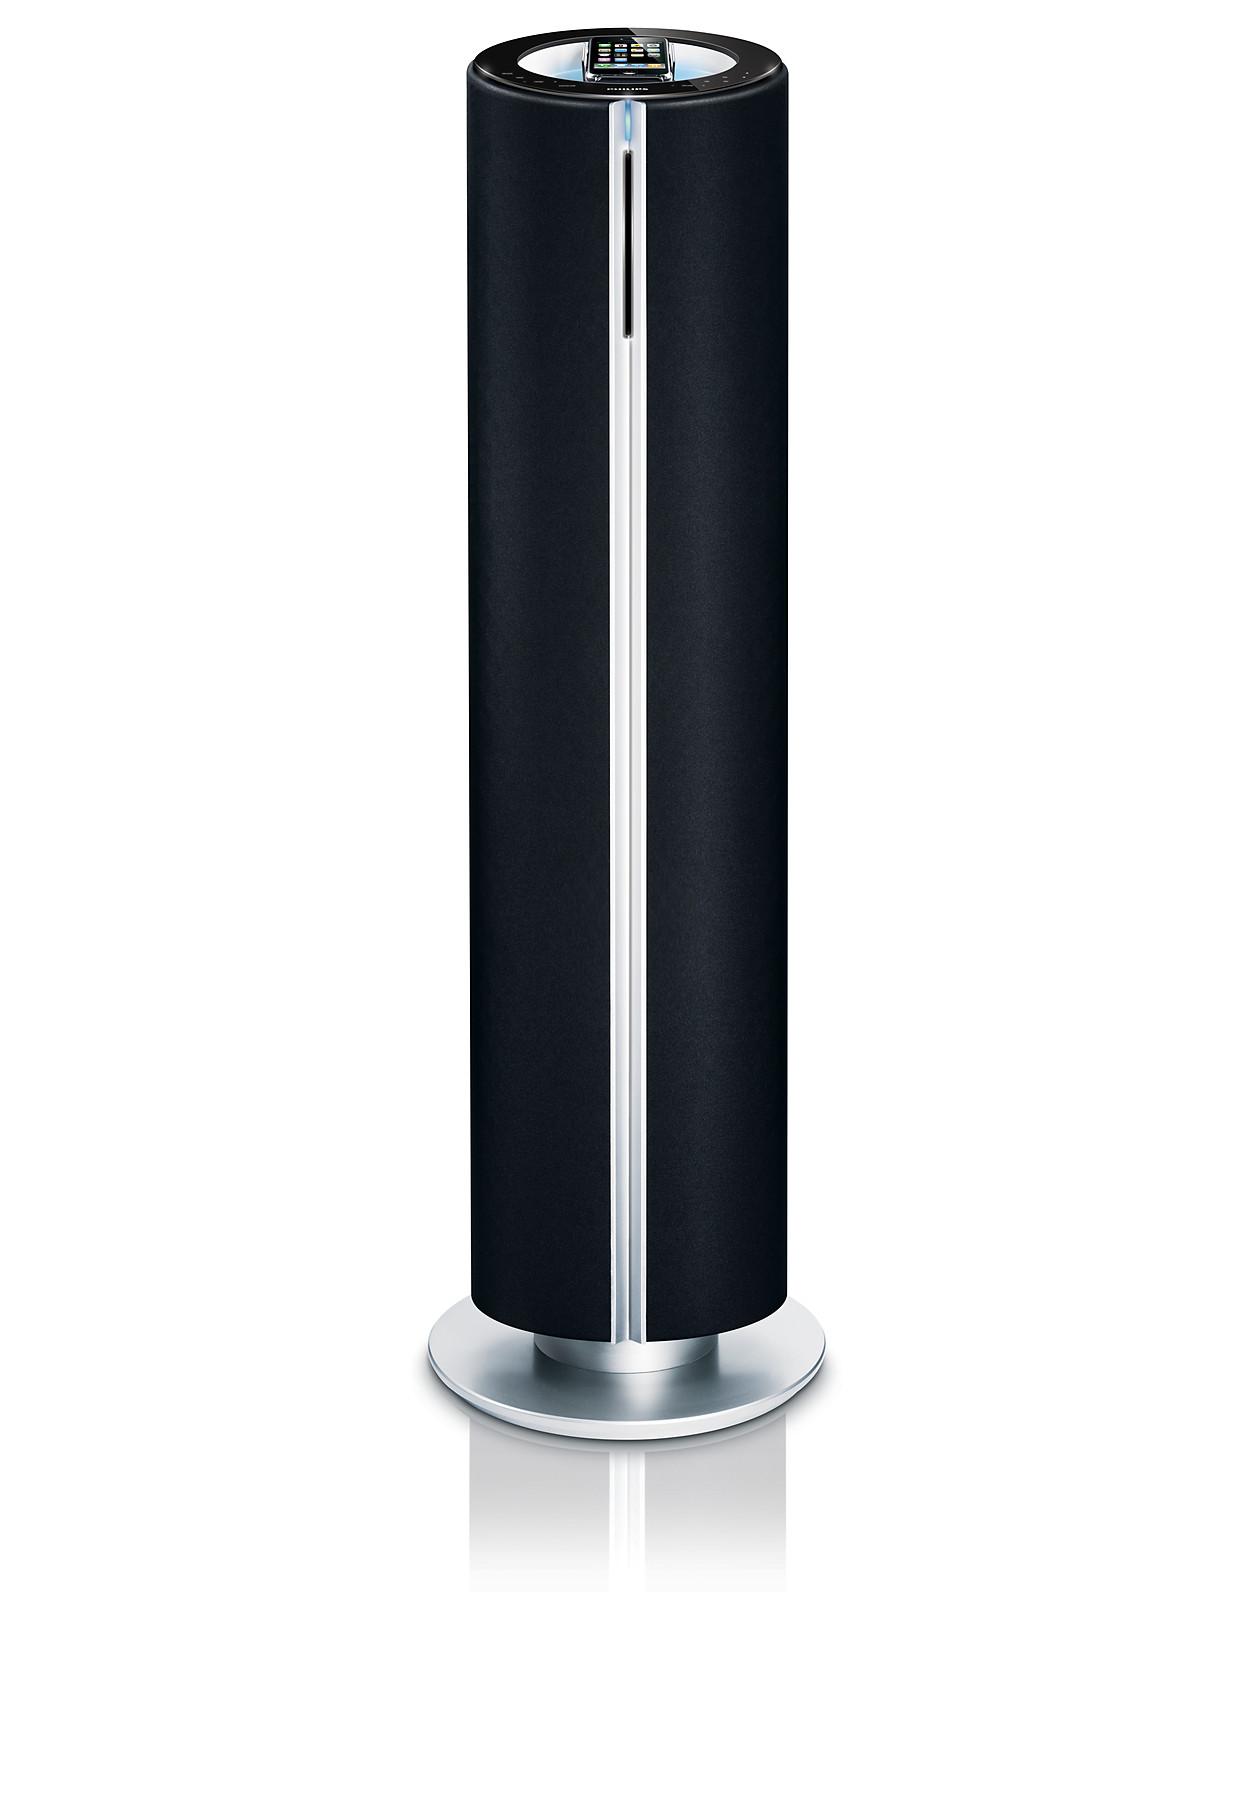 station d 39 accueil pour ipod iphone dcm580 12 philips. Black Bedroom Furniture Sets. Home Design Ideas